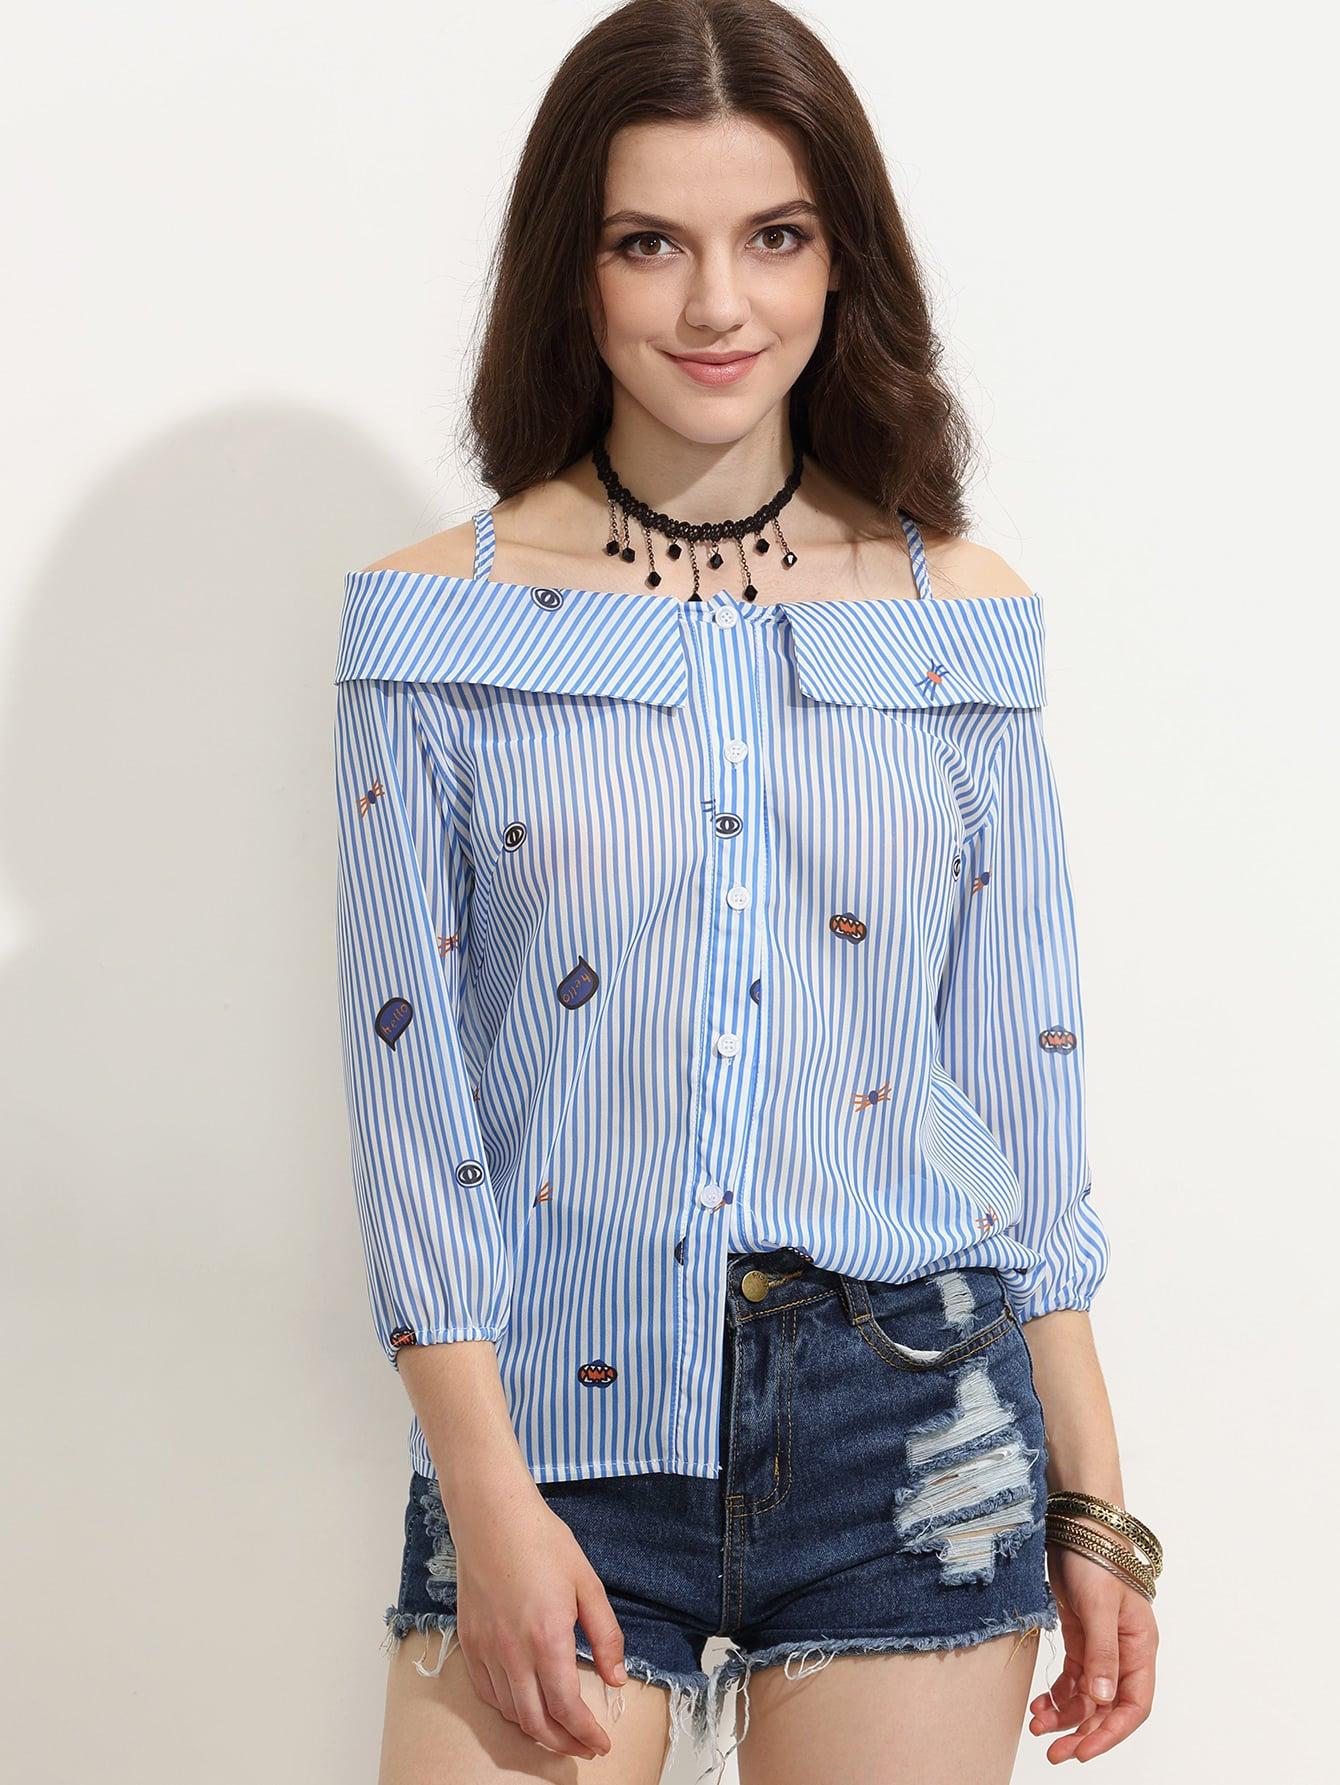 Blue Striped Cartoon Print Cold Shoulder Fold Over Blouse blouse160713304